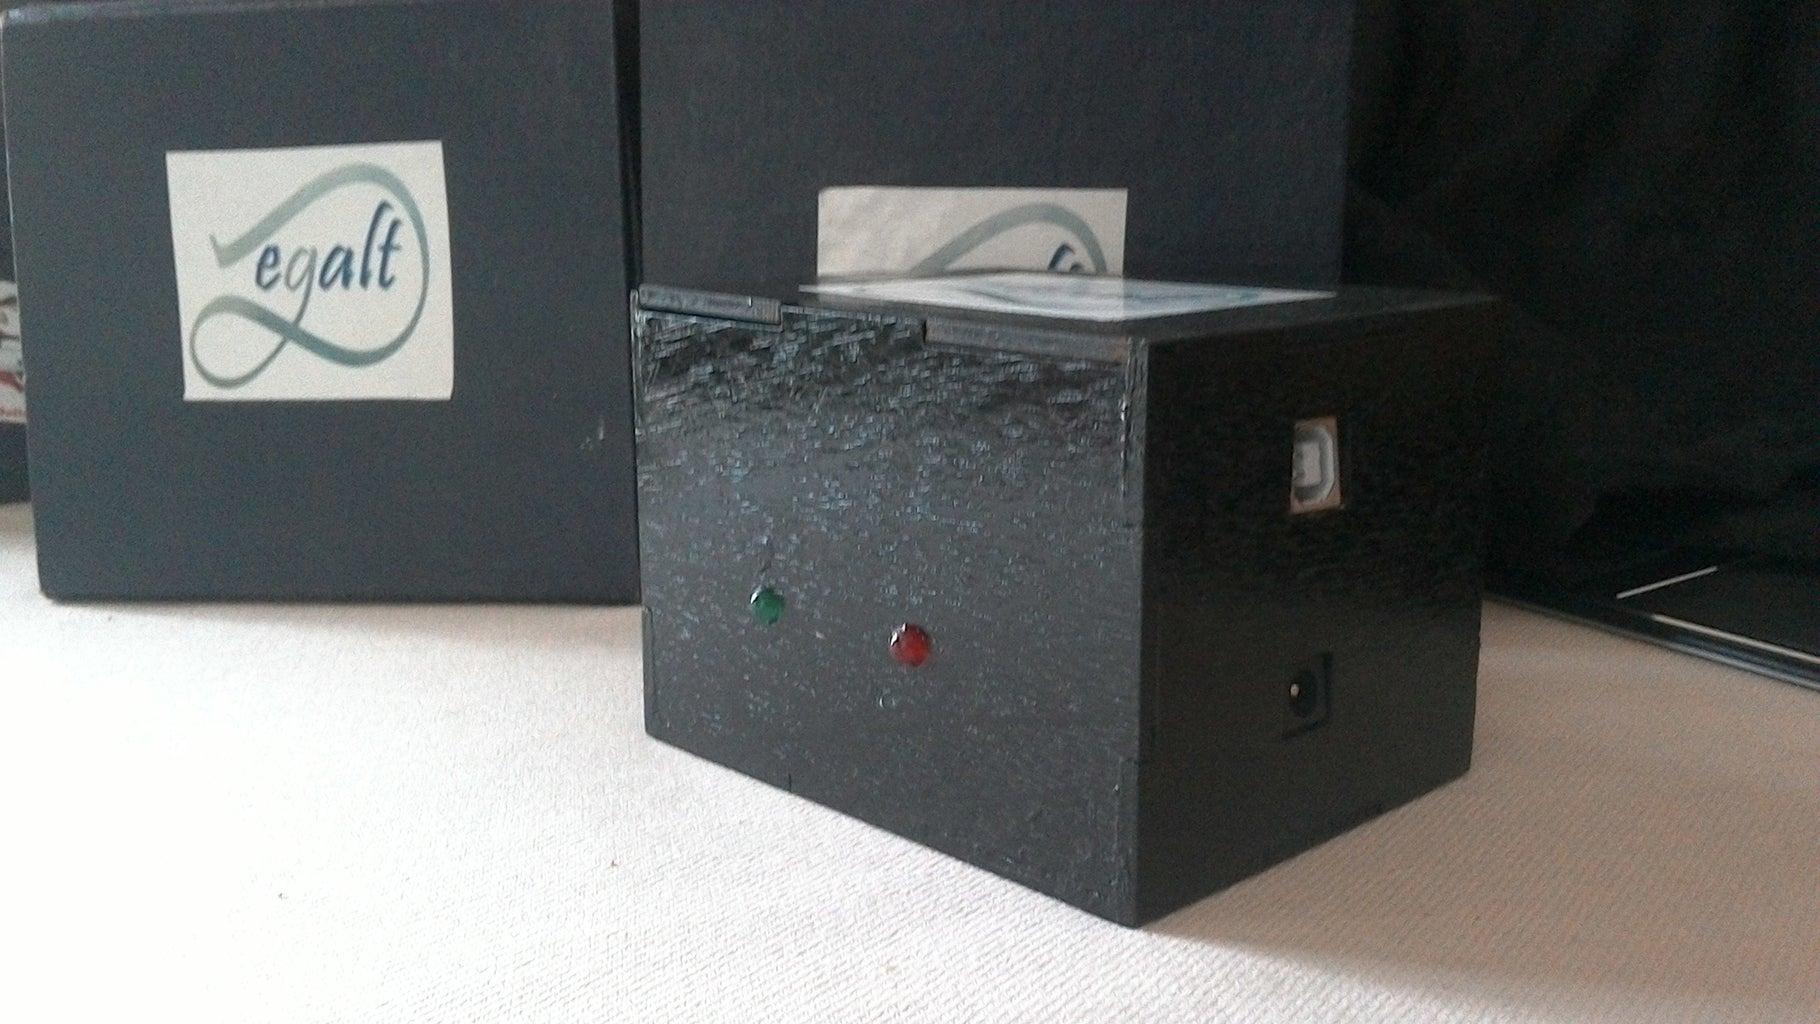 Mutligas Detector (i-butane, Propane, Methane, Alcohol, Hydrogen and Smoke) Using Arduino and MQ2